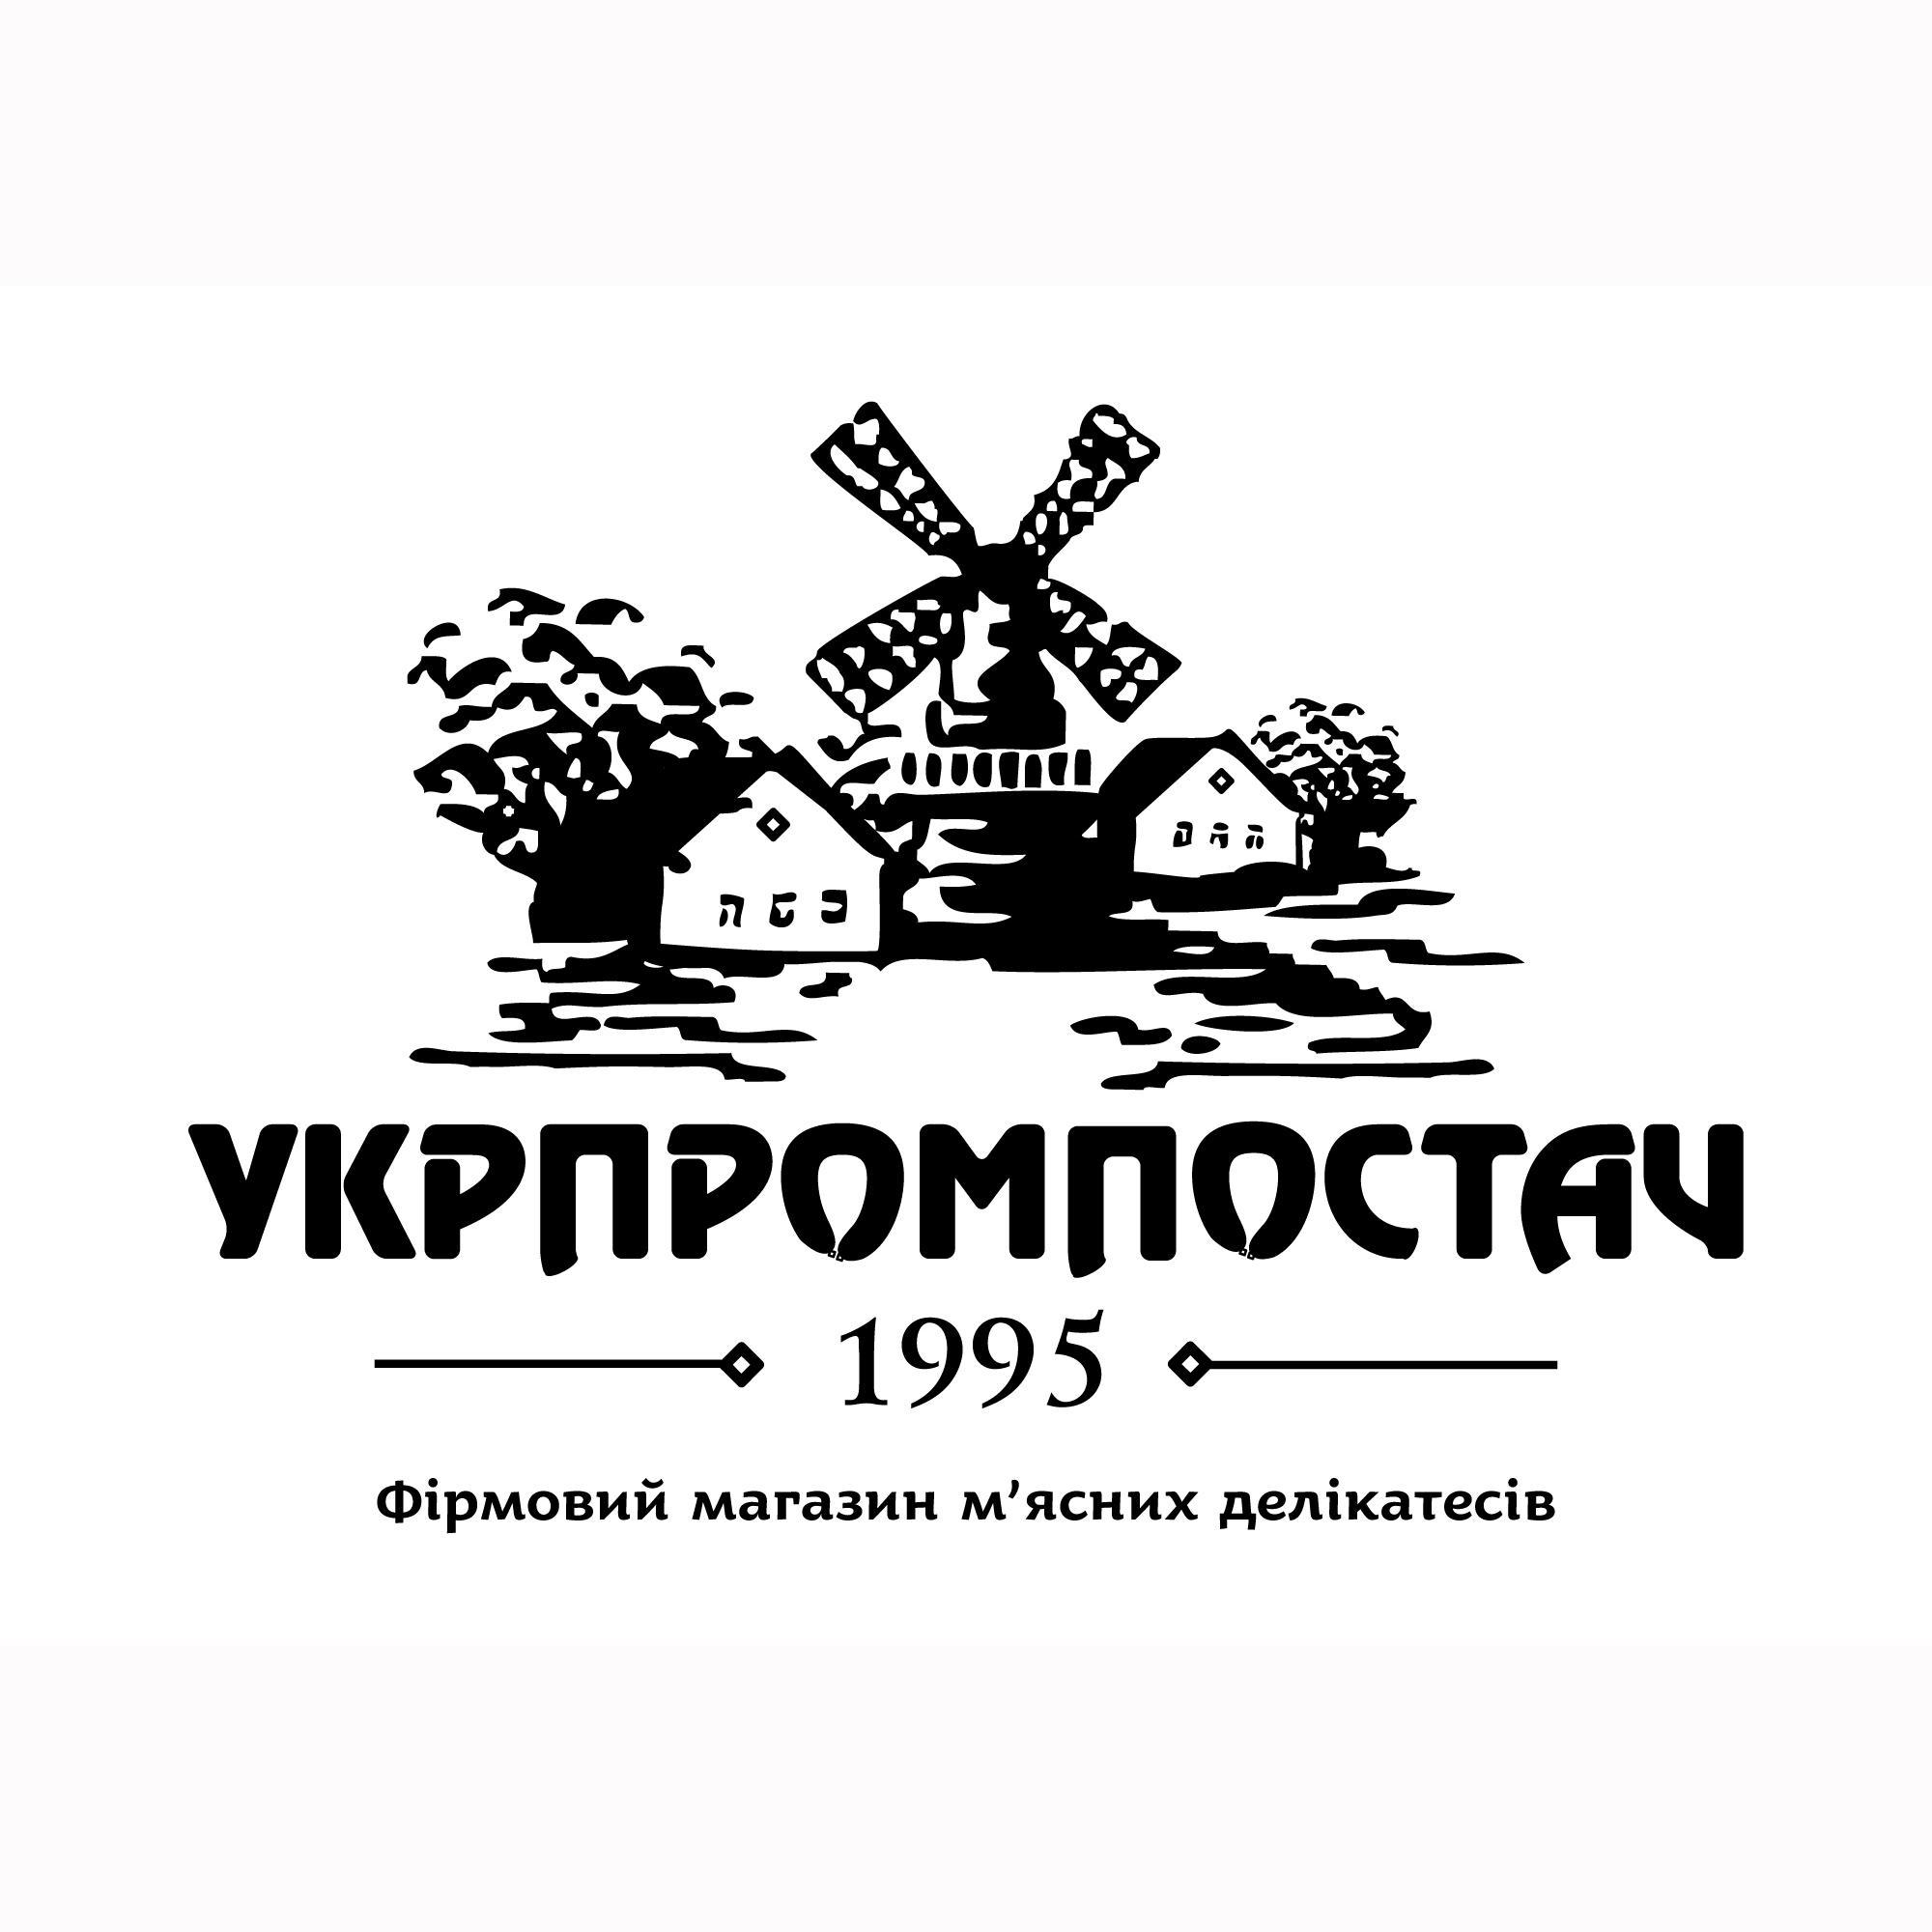 Укрпромпостач